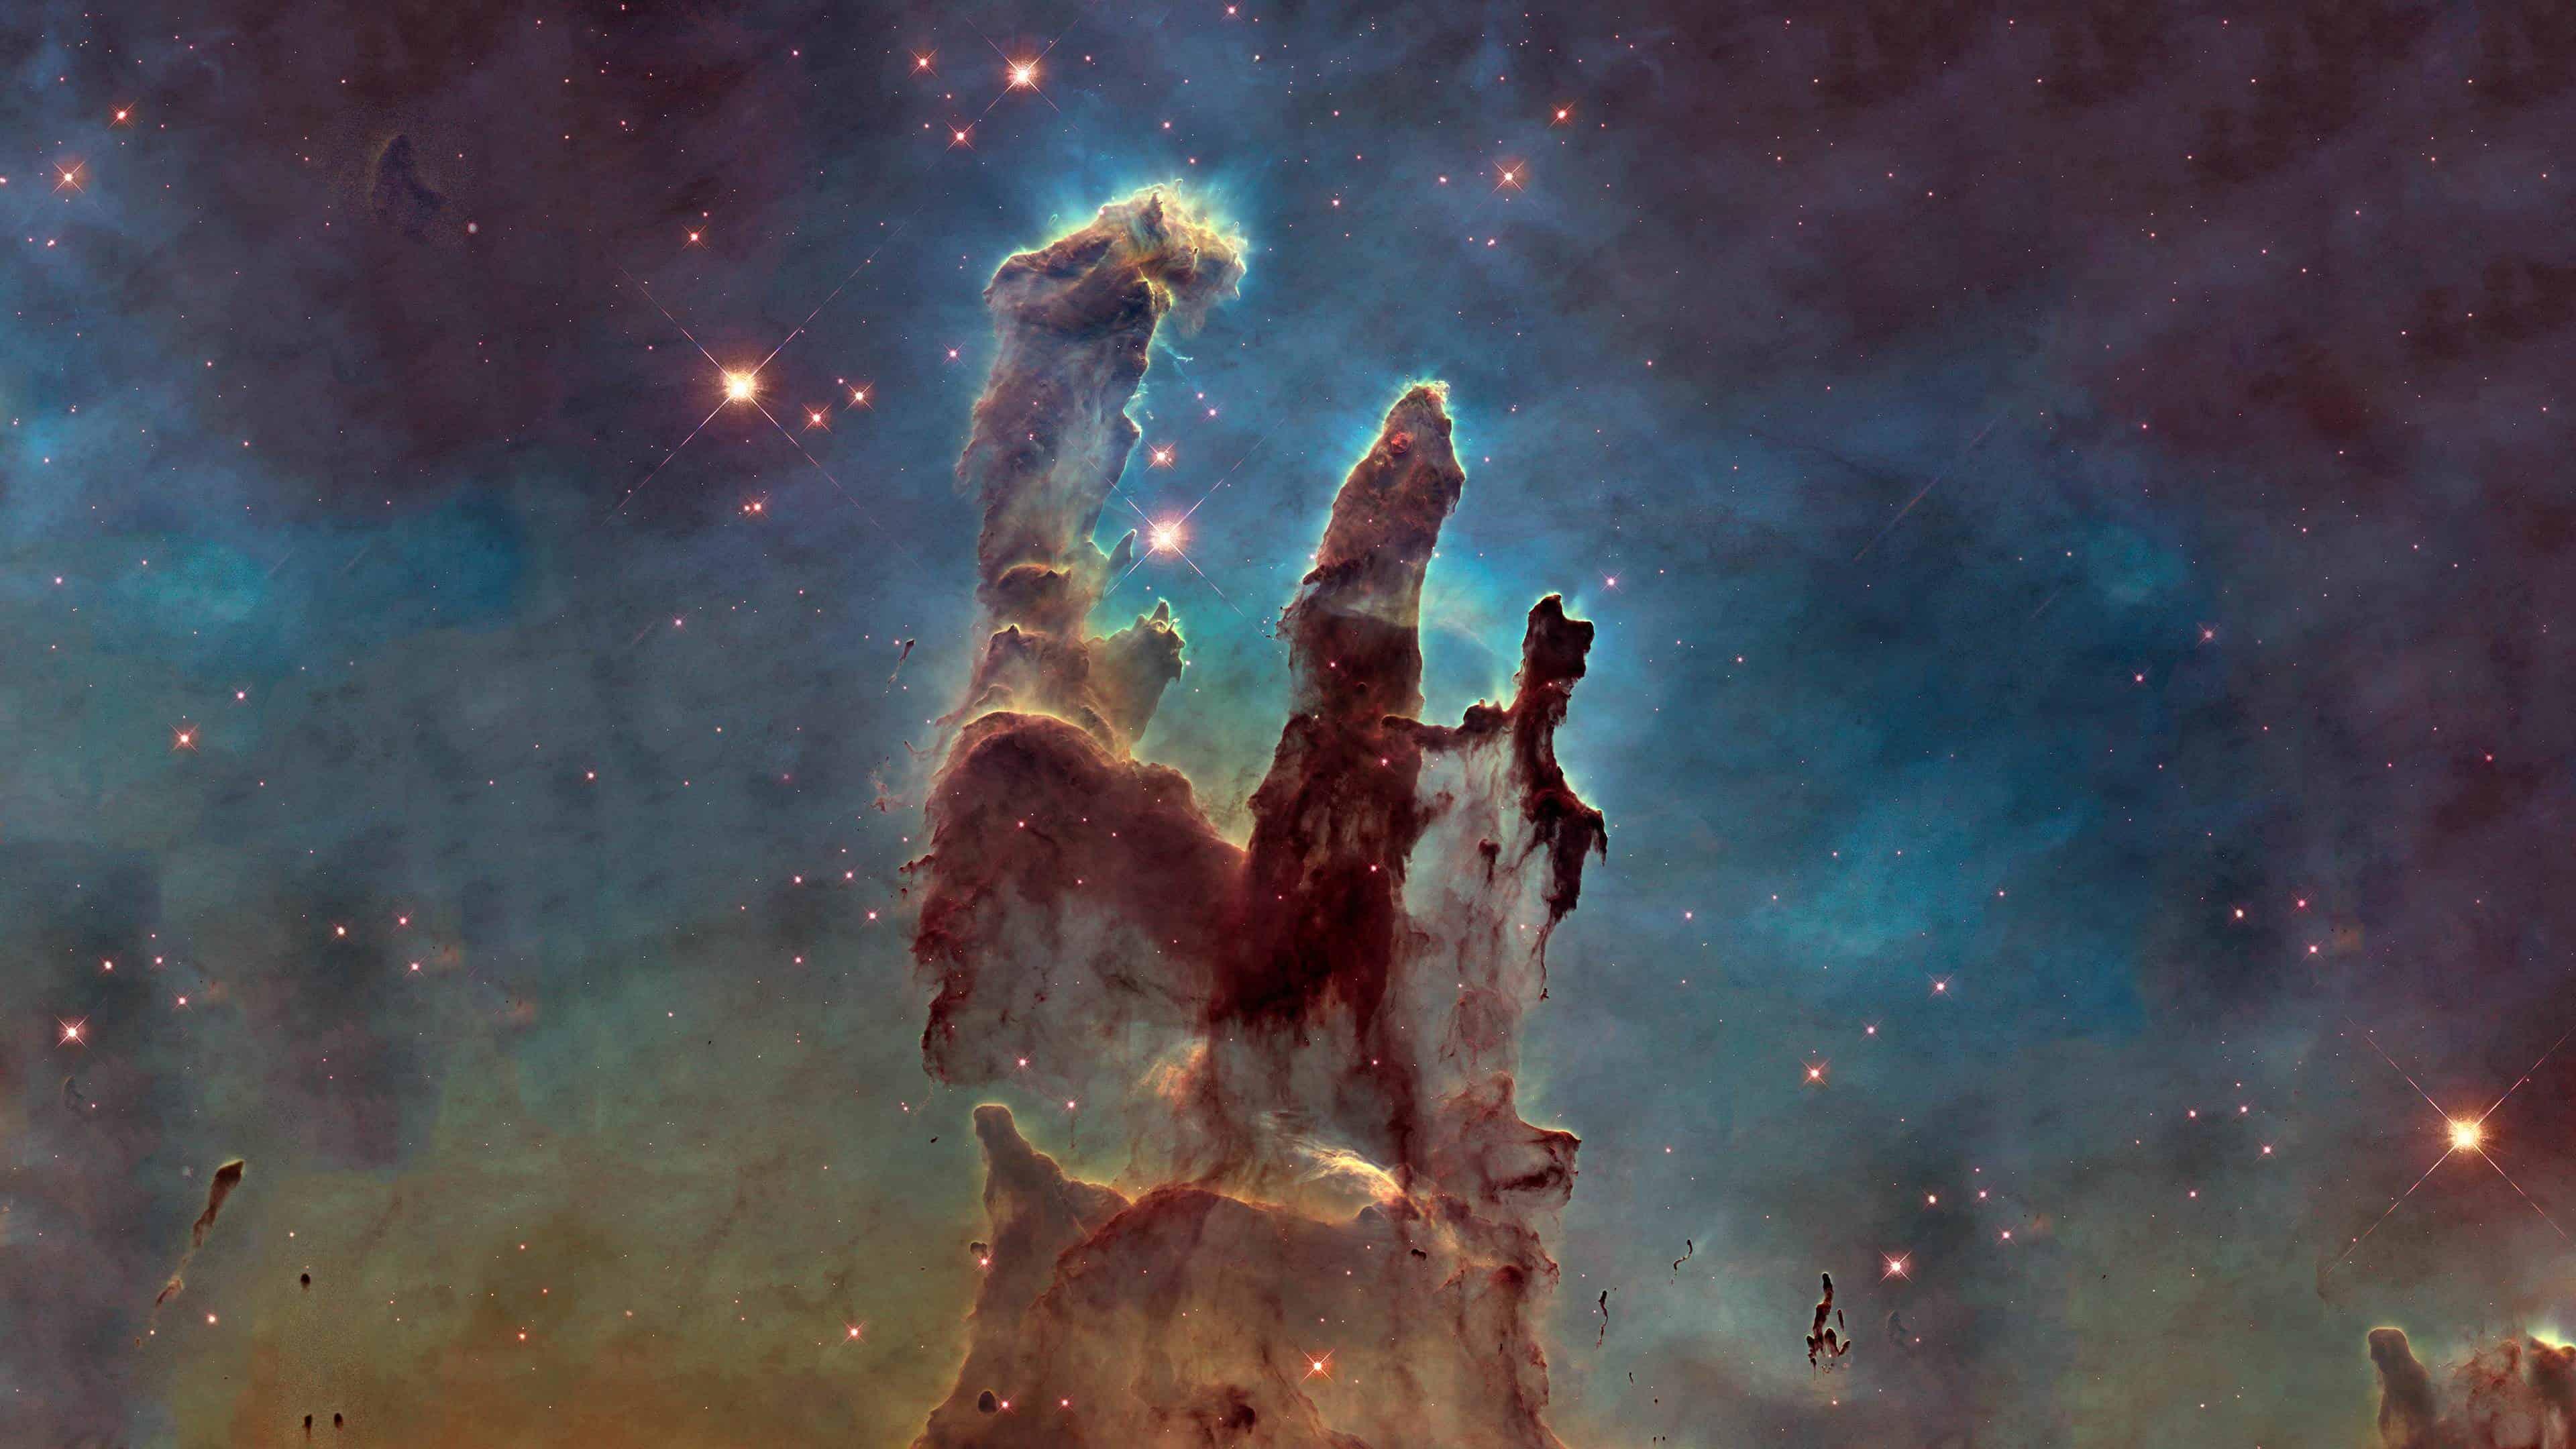 eagles nebula pillars of creation uhd 4k wallpaper